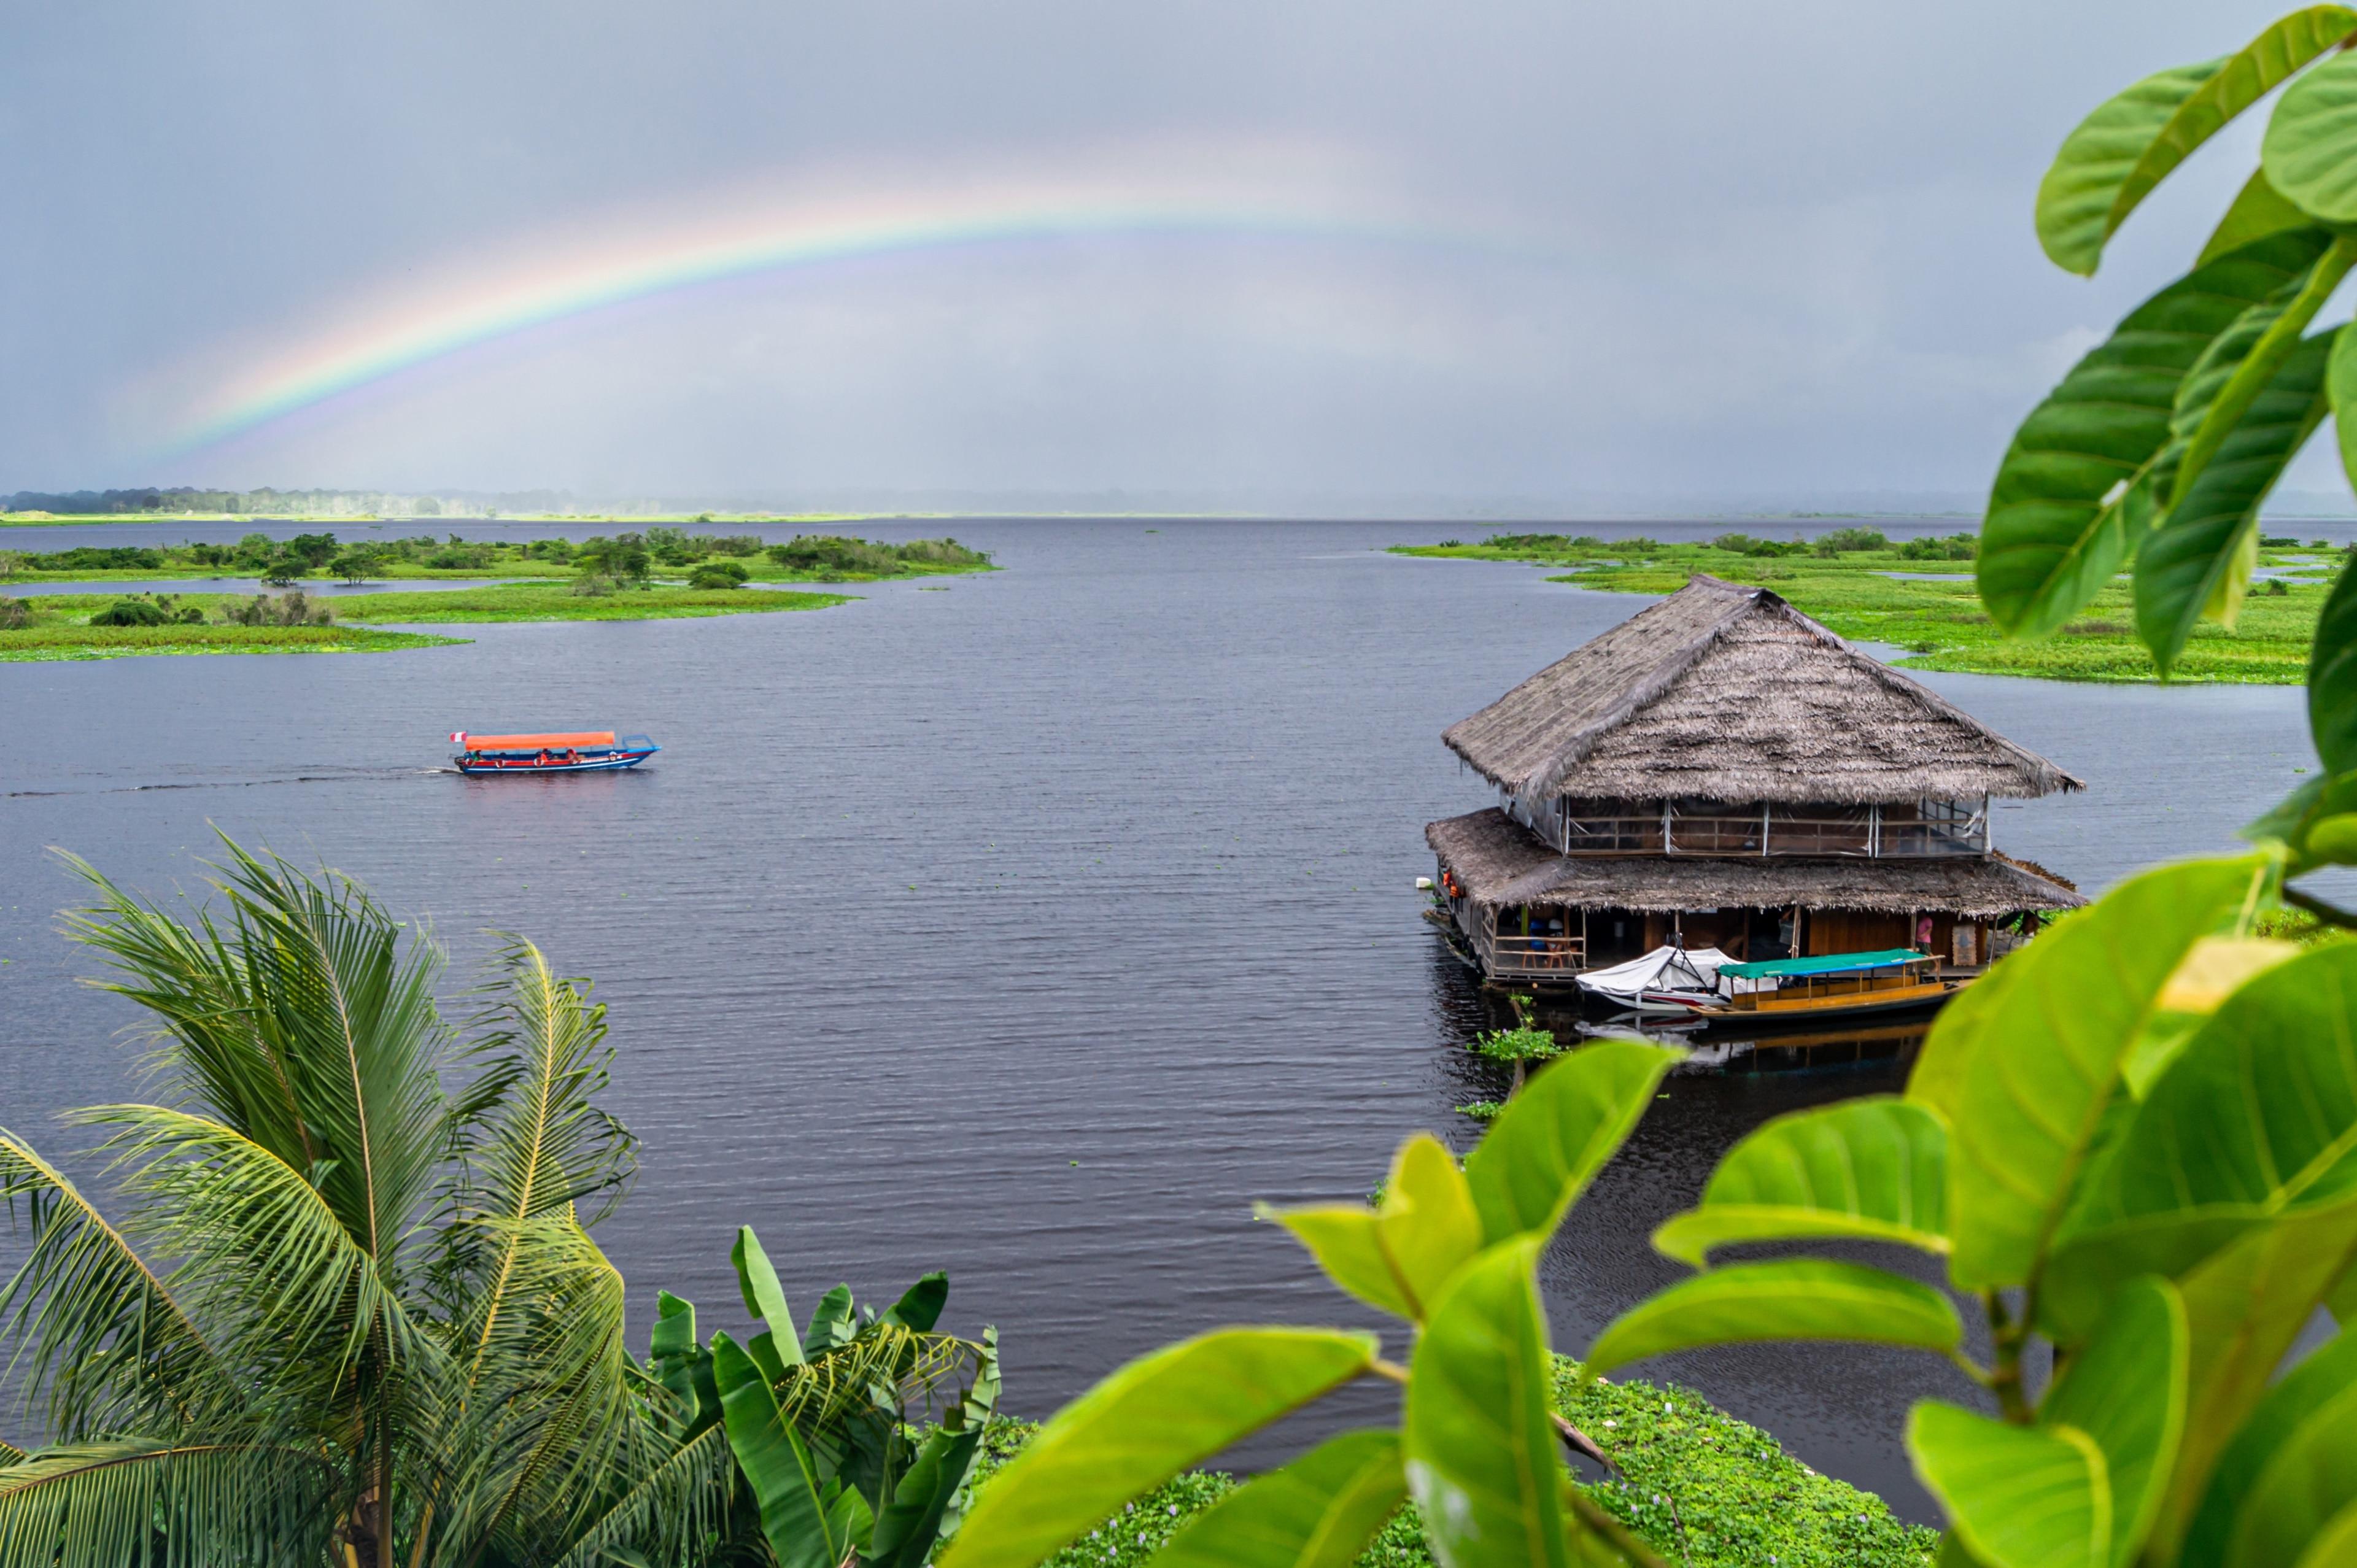 Iquitos, Loreto Region, Peru